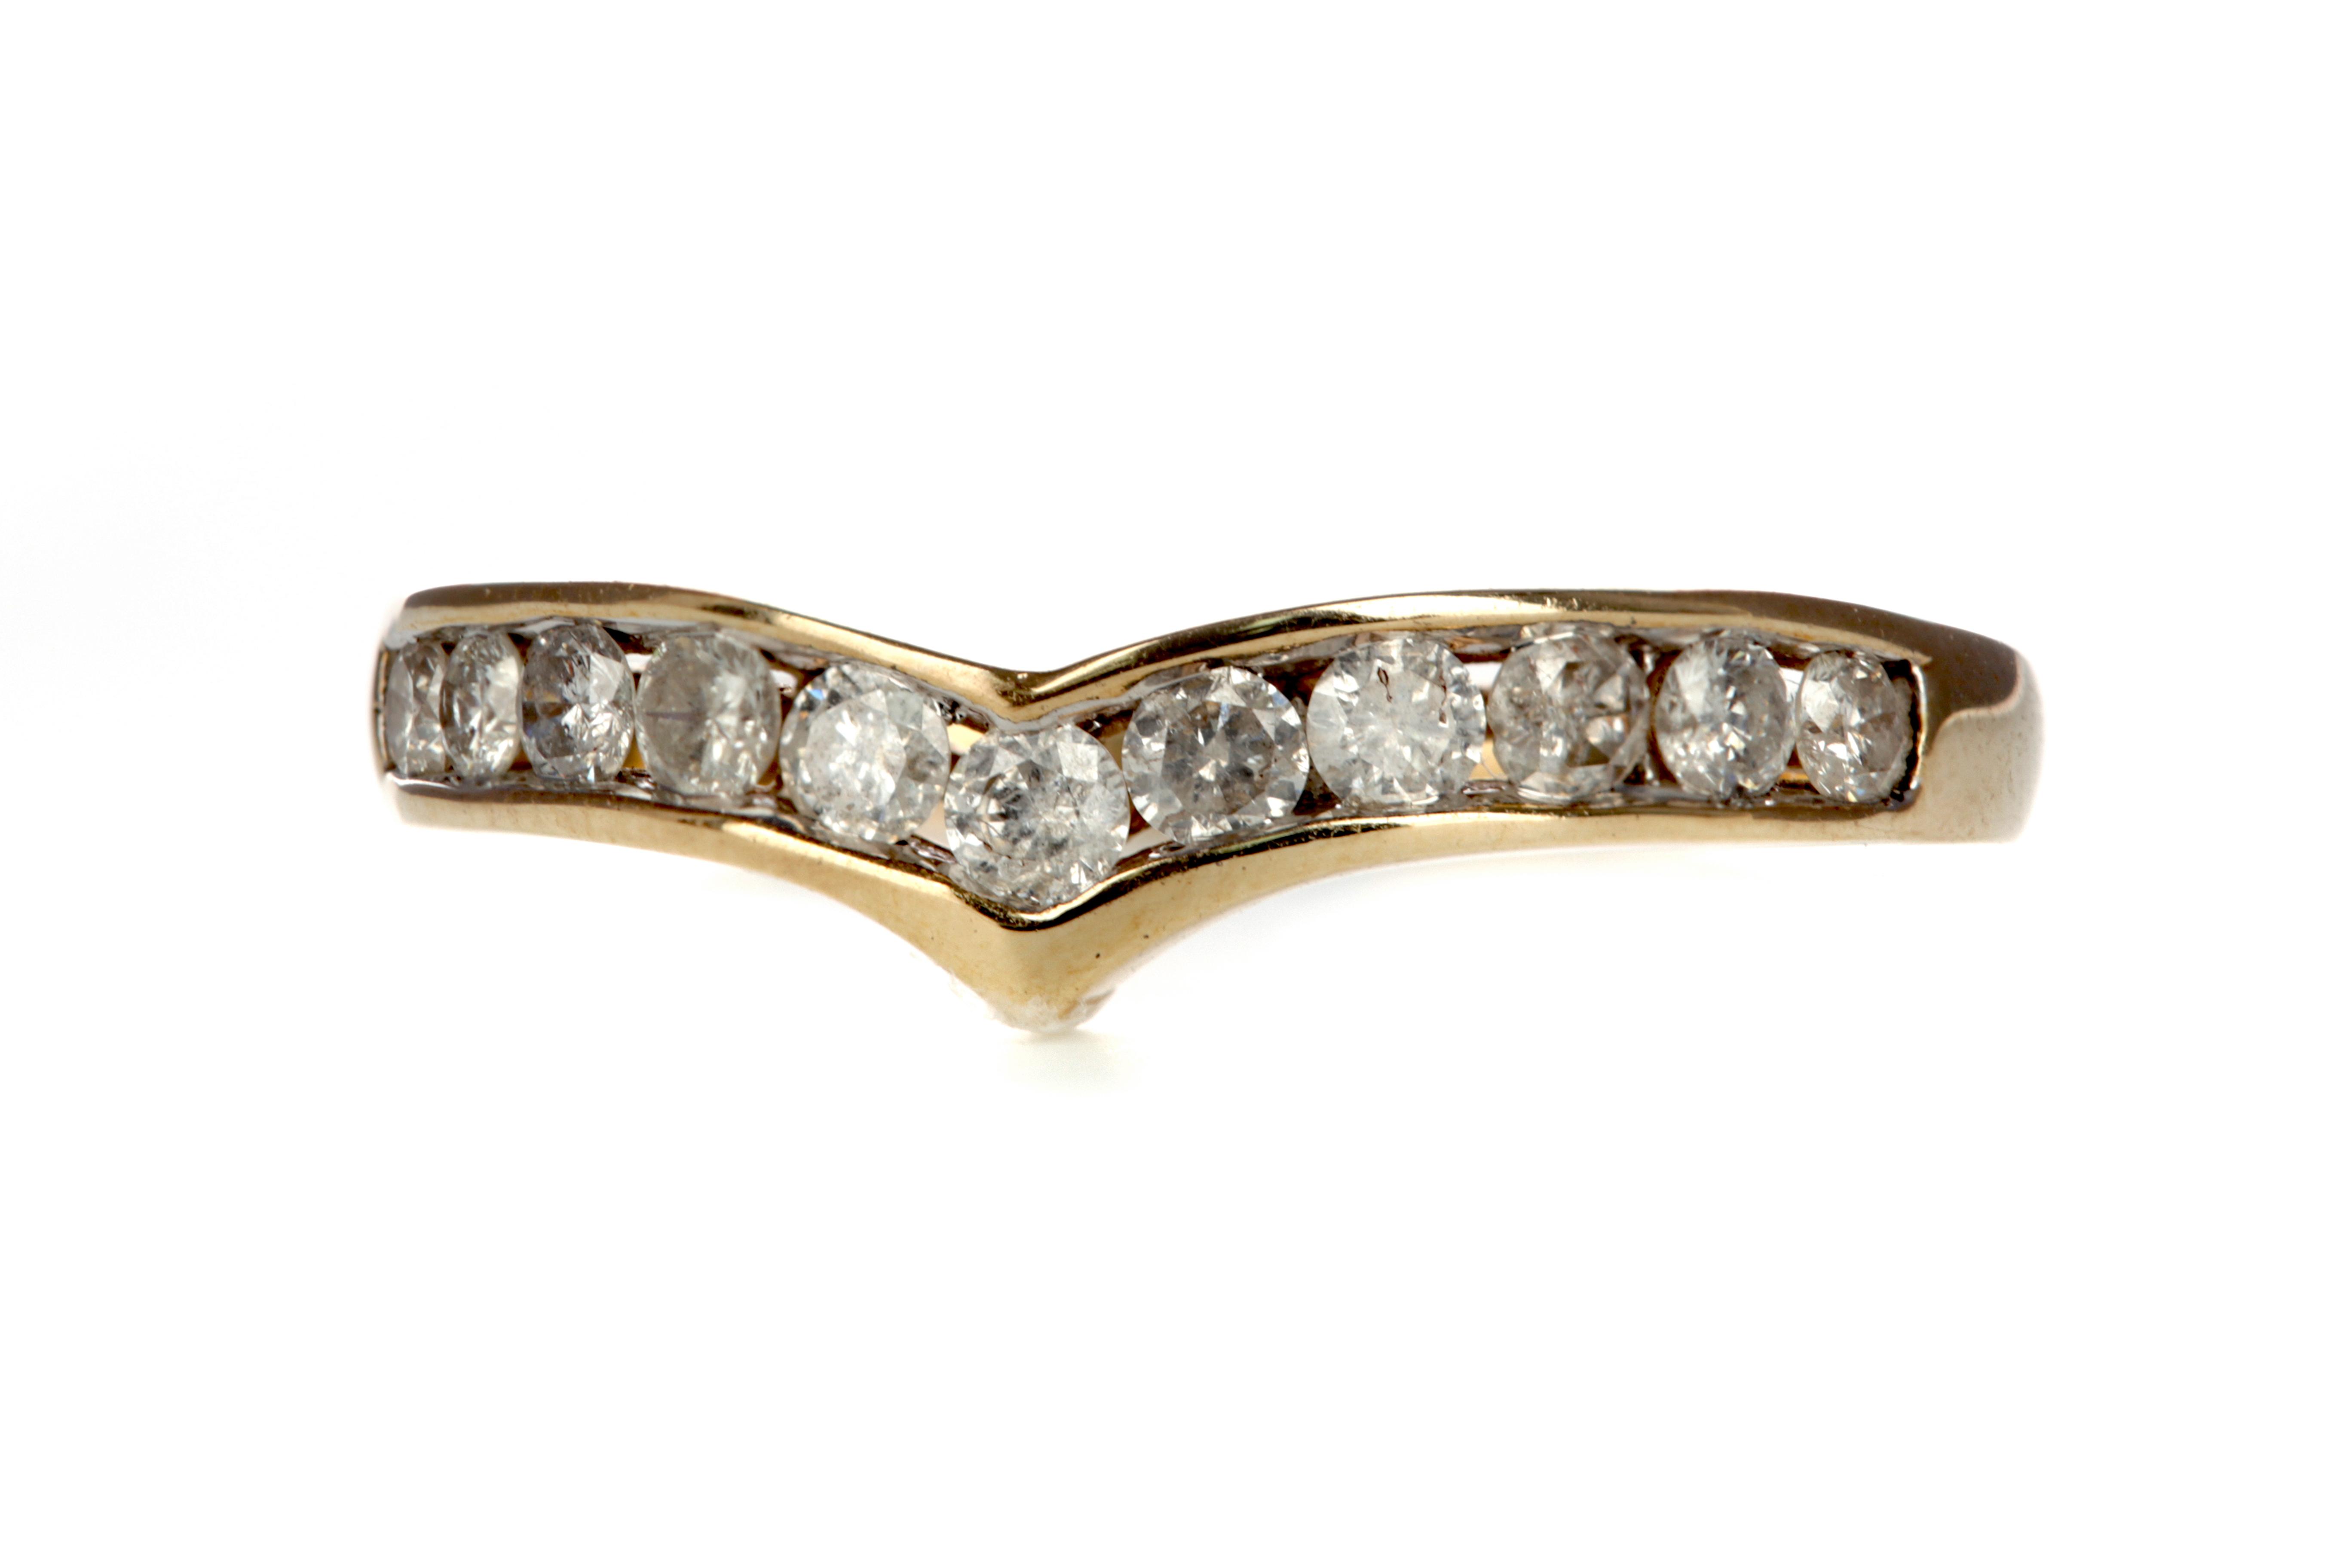 A DIAMOND WISHBONE RING